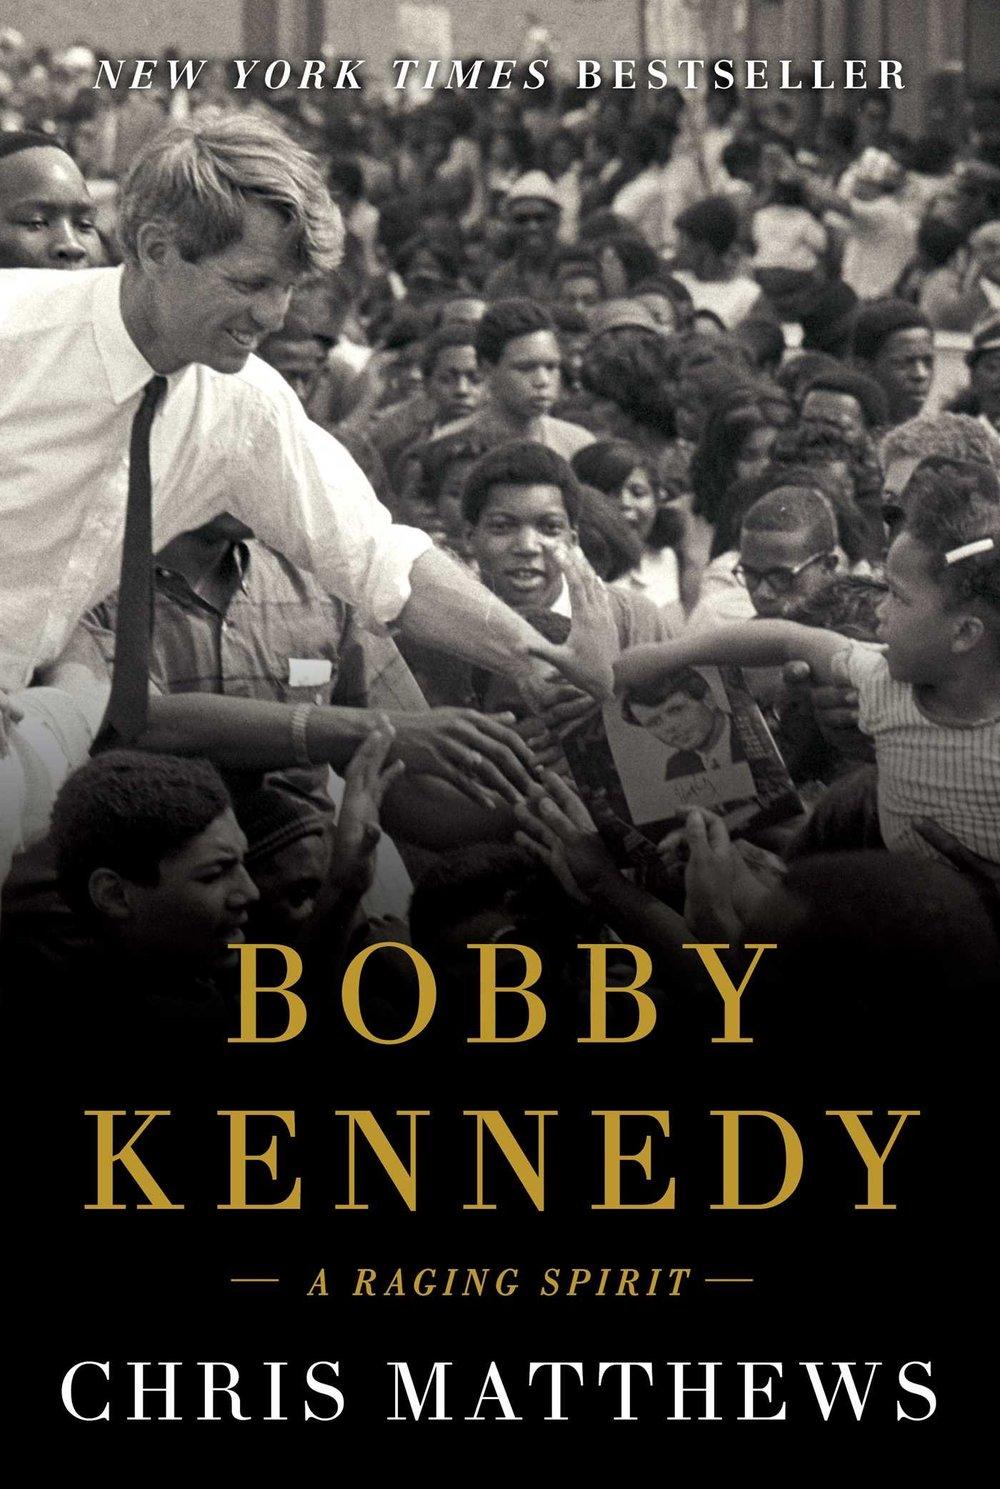 Bobby Kennedy- A Raging Spirit by Chris Matthews.jpg